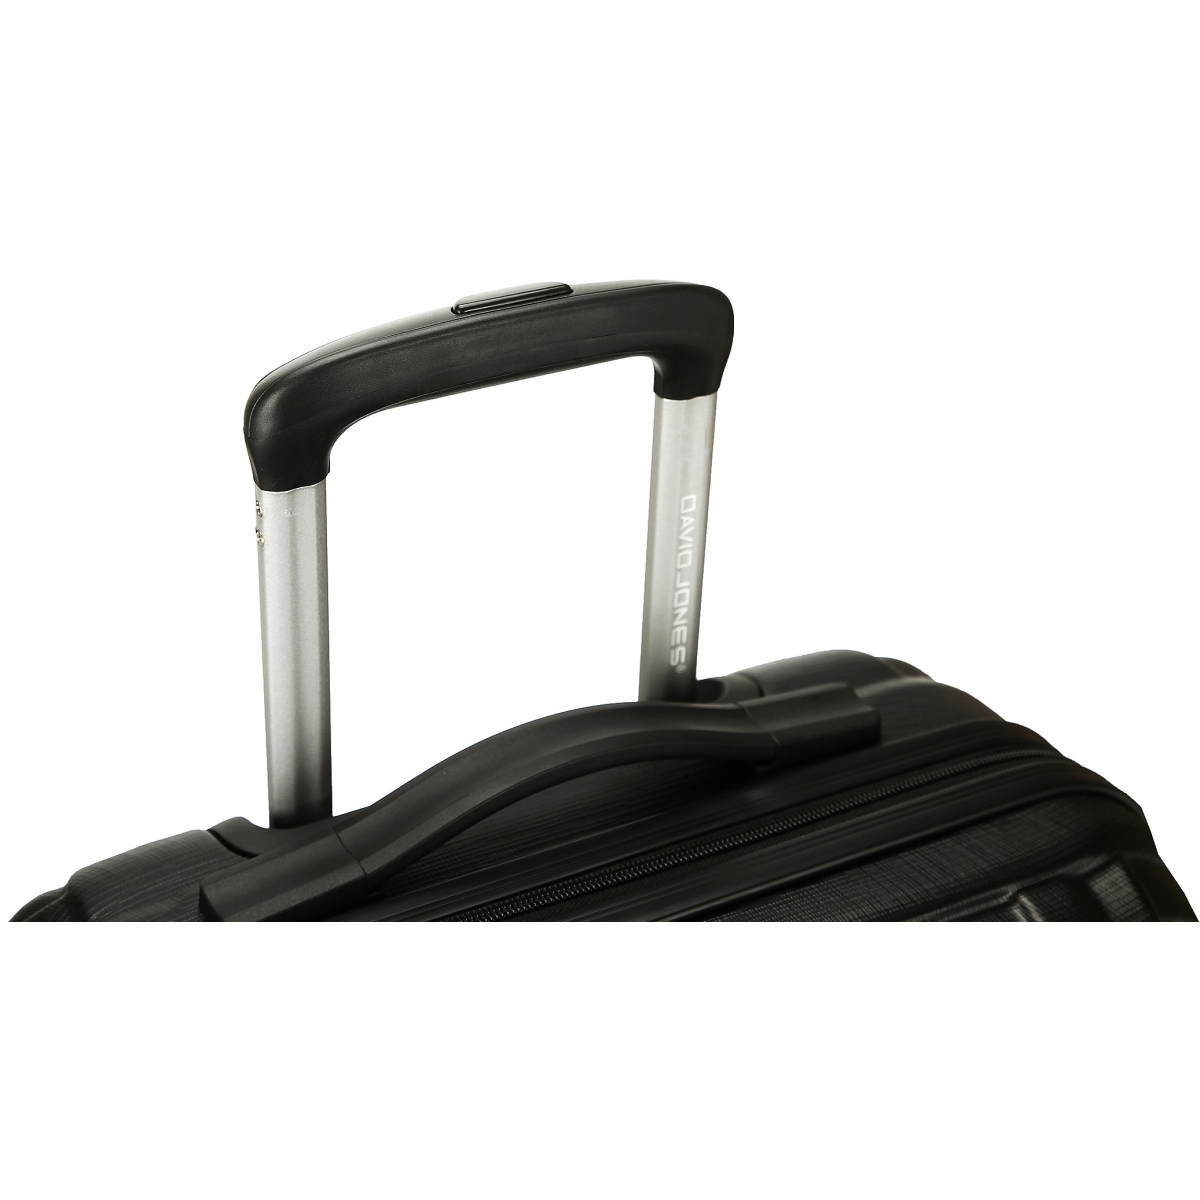 valise rigide david jones taille g 76cm ba10171g couleur principale black valise pas. Black Bedroom Furniture Sets. Home Design Ideas